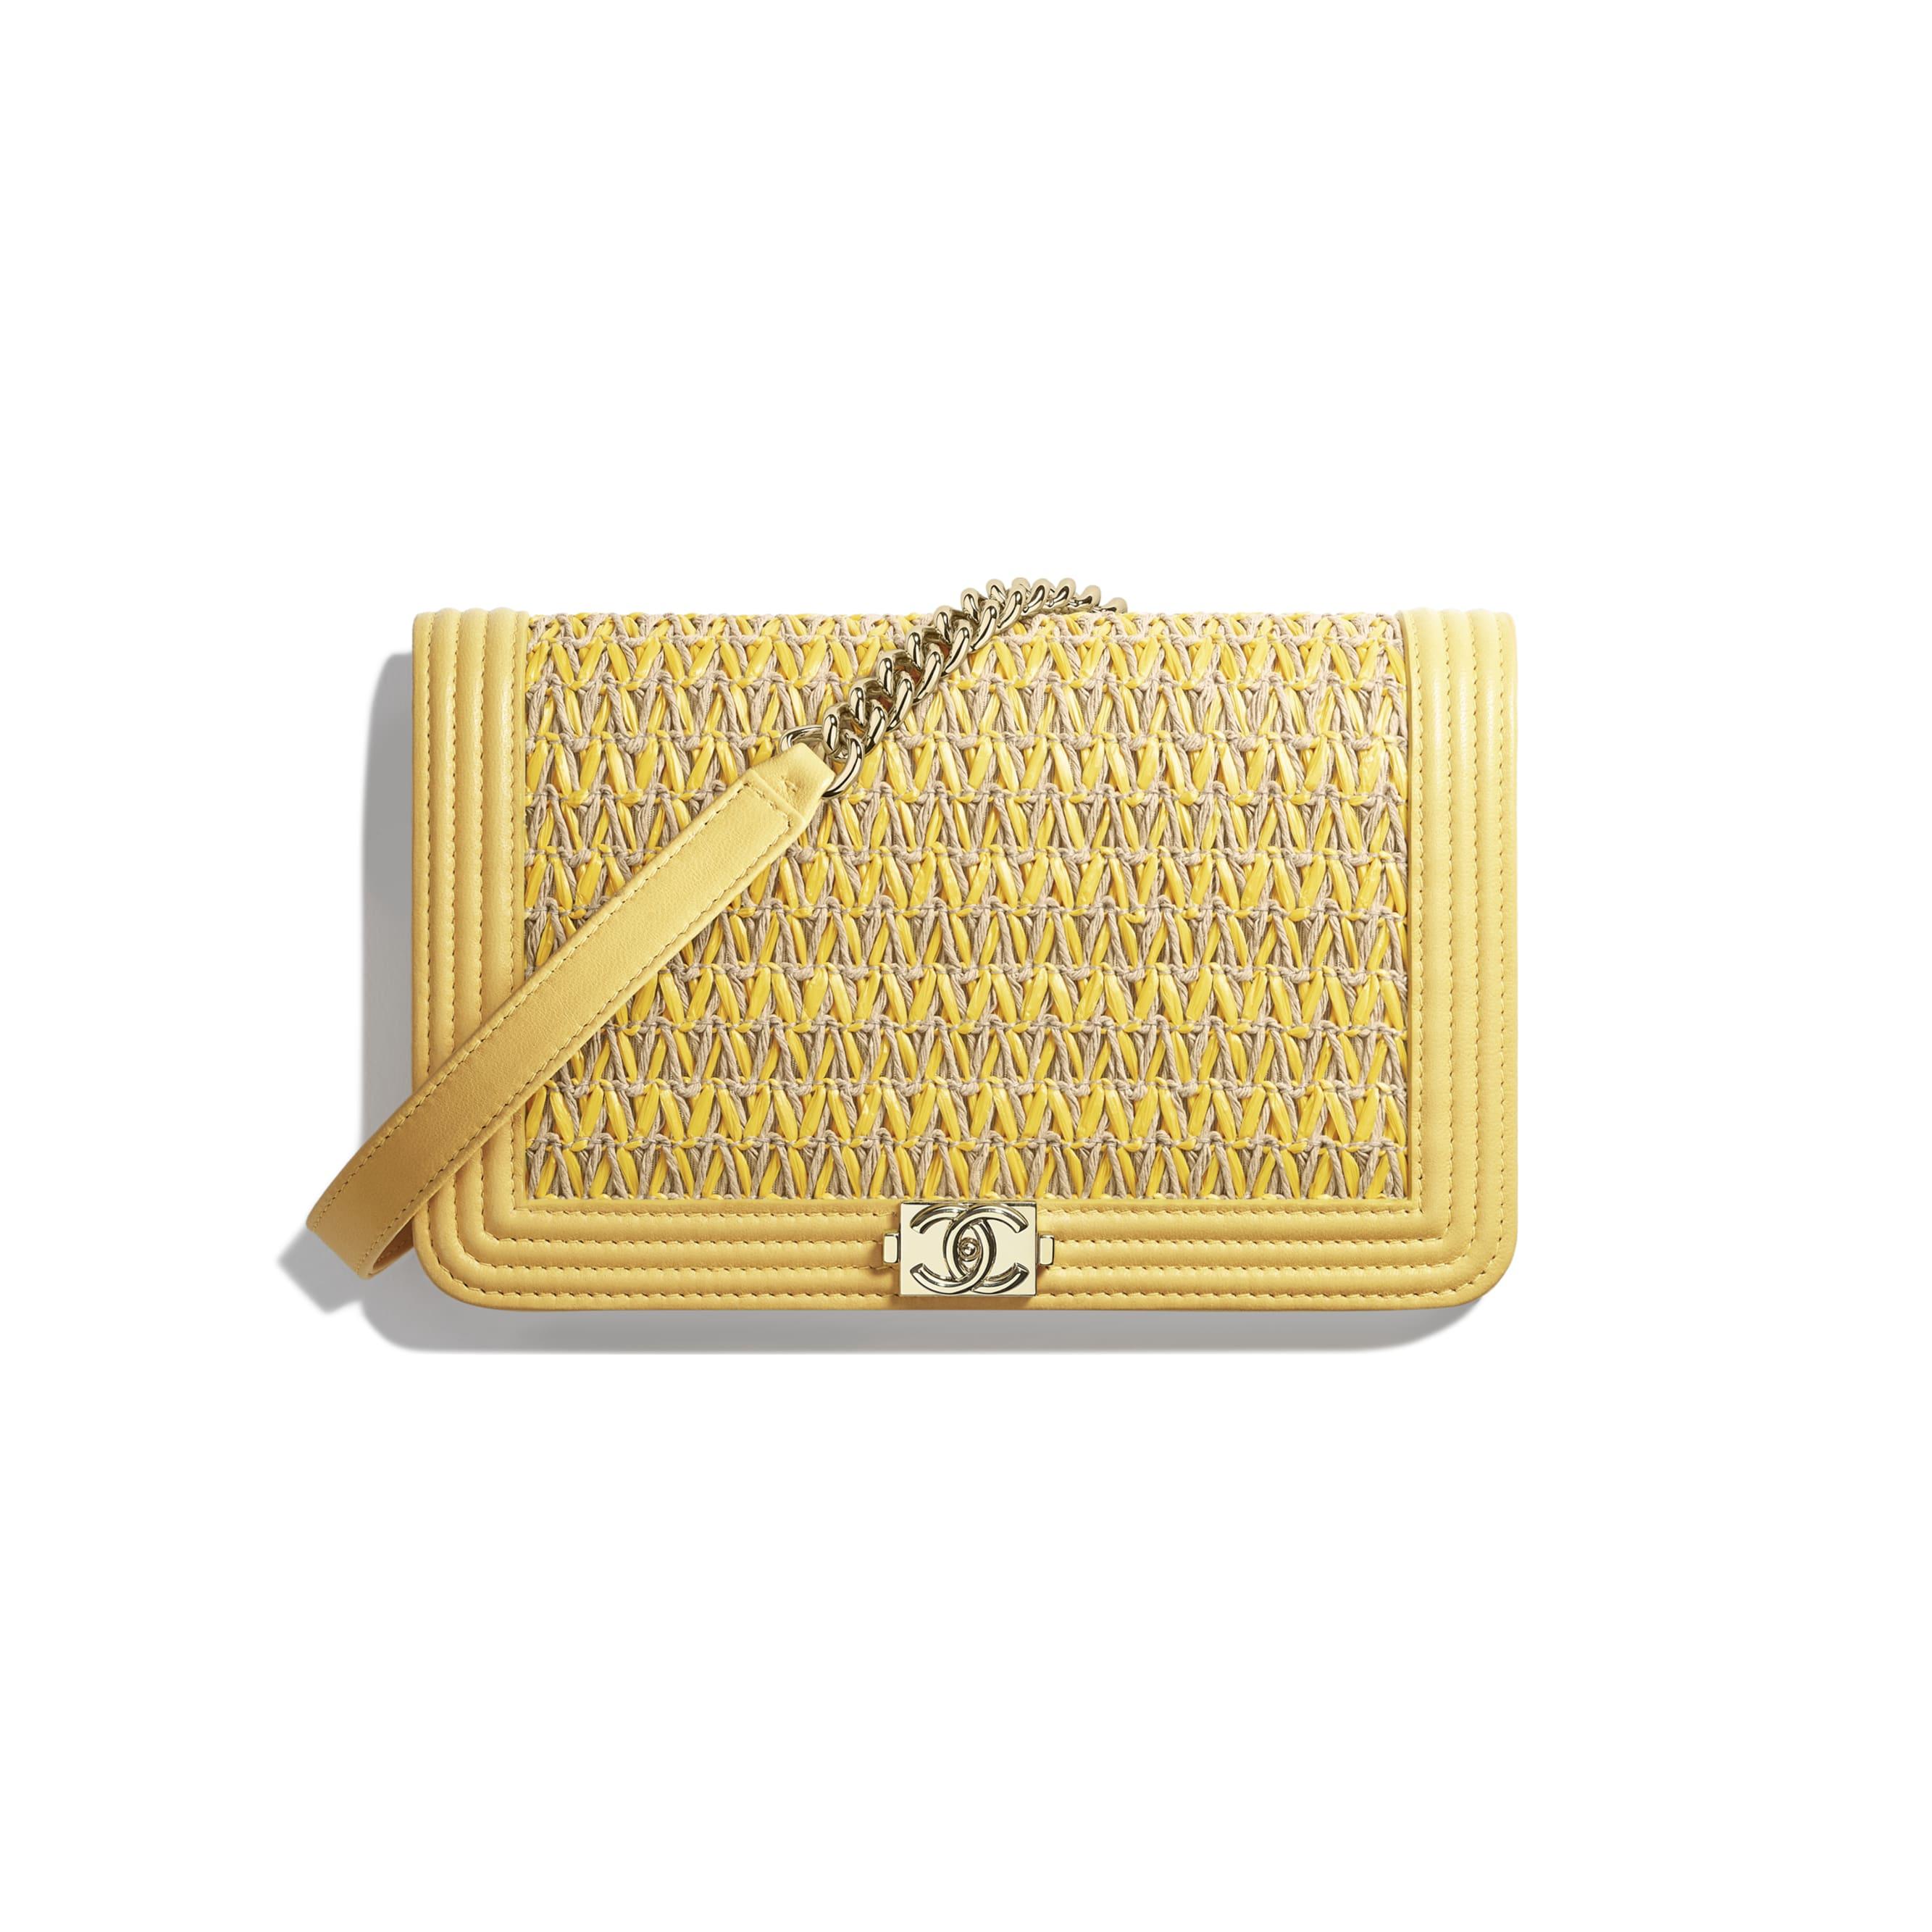 BOY CHANEL Wallet on Chain - Yellow & Beige - Cotton, Lambskin & Gold-Tone Metal - Default view - see standard sized version